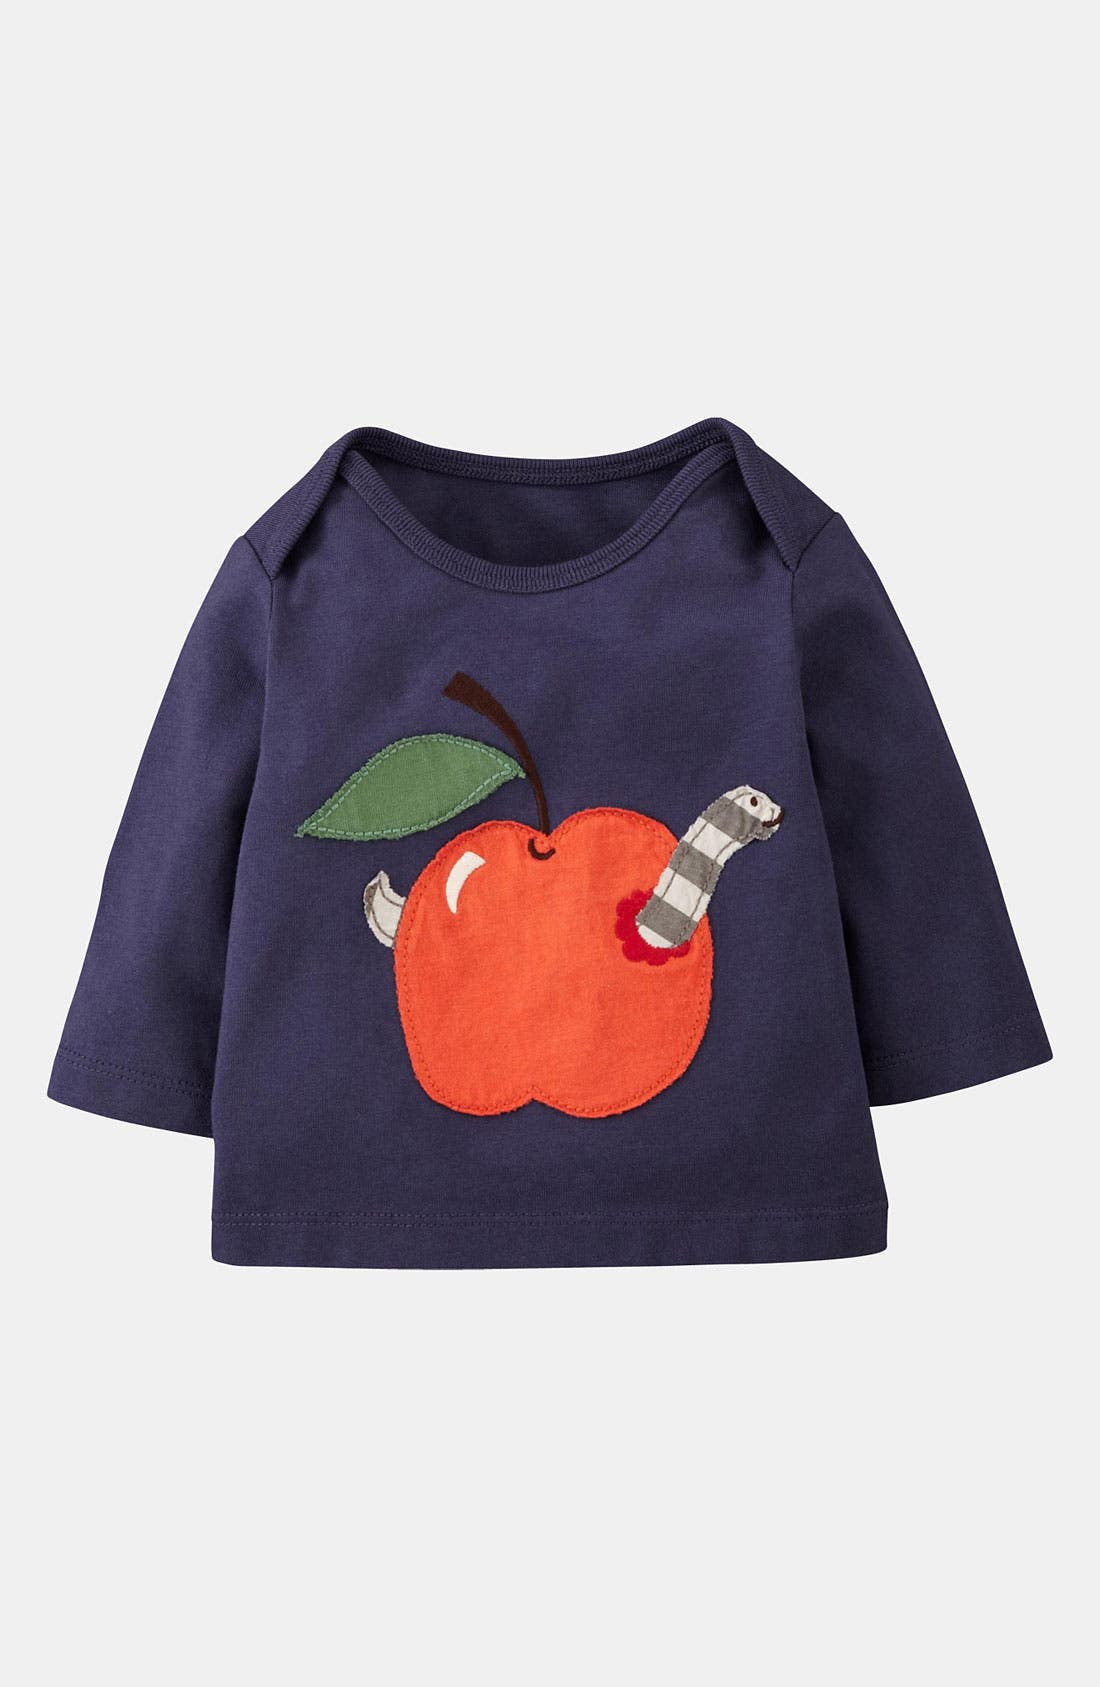 Main Image - Mini Boden 'Garden Friends' T-Shirt (Infant)